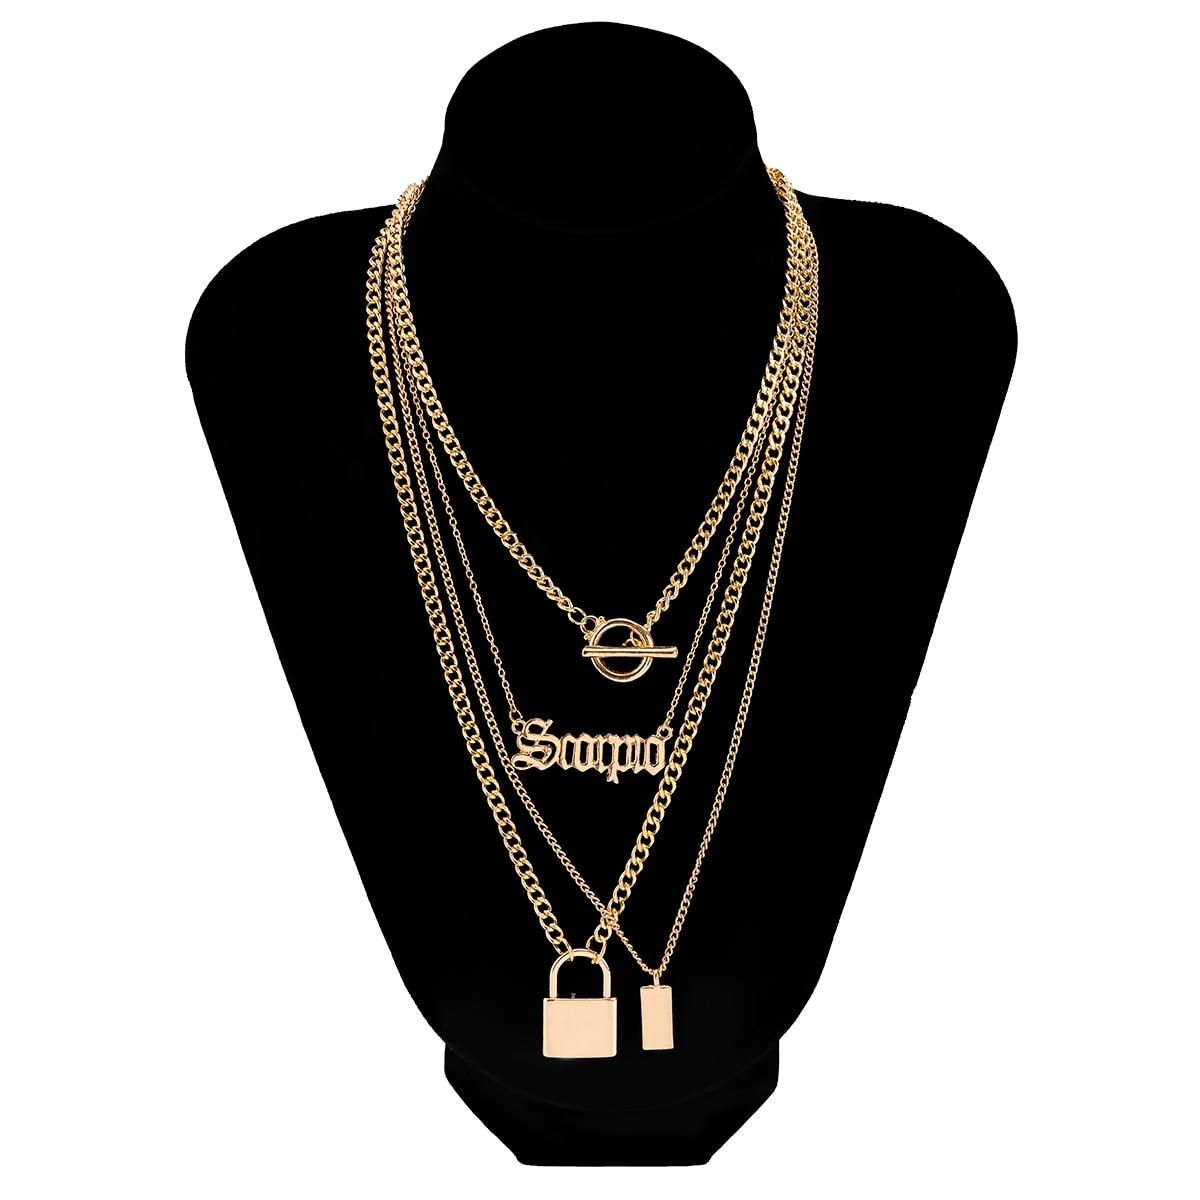 2Pcs/Set Punk Bijoux Toggle Clasp Choker Collier Fashion Scorpio Letter Lock Pendant Neck For Women Man Gothic Chain Necklace  - buy with discount